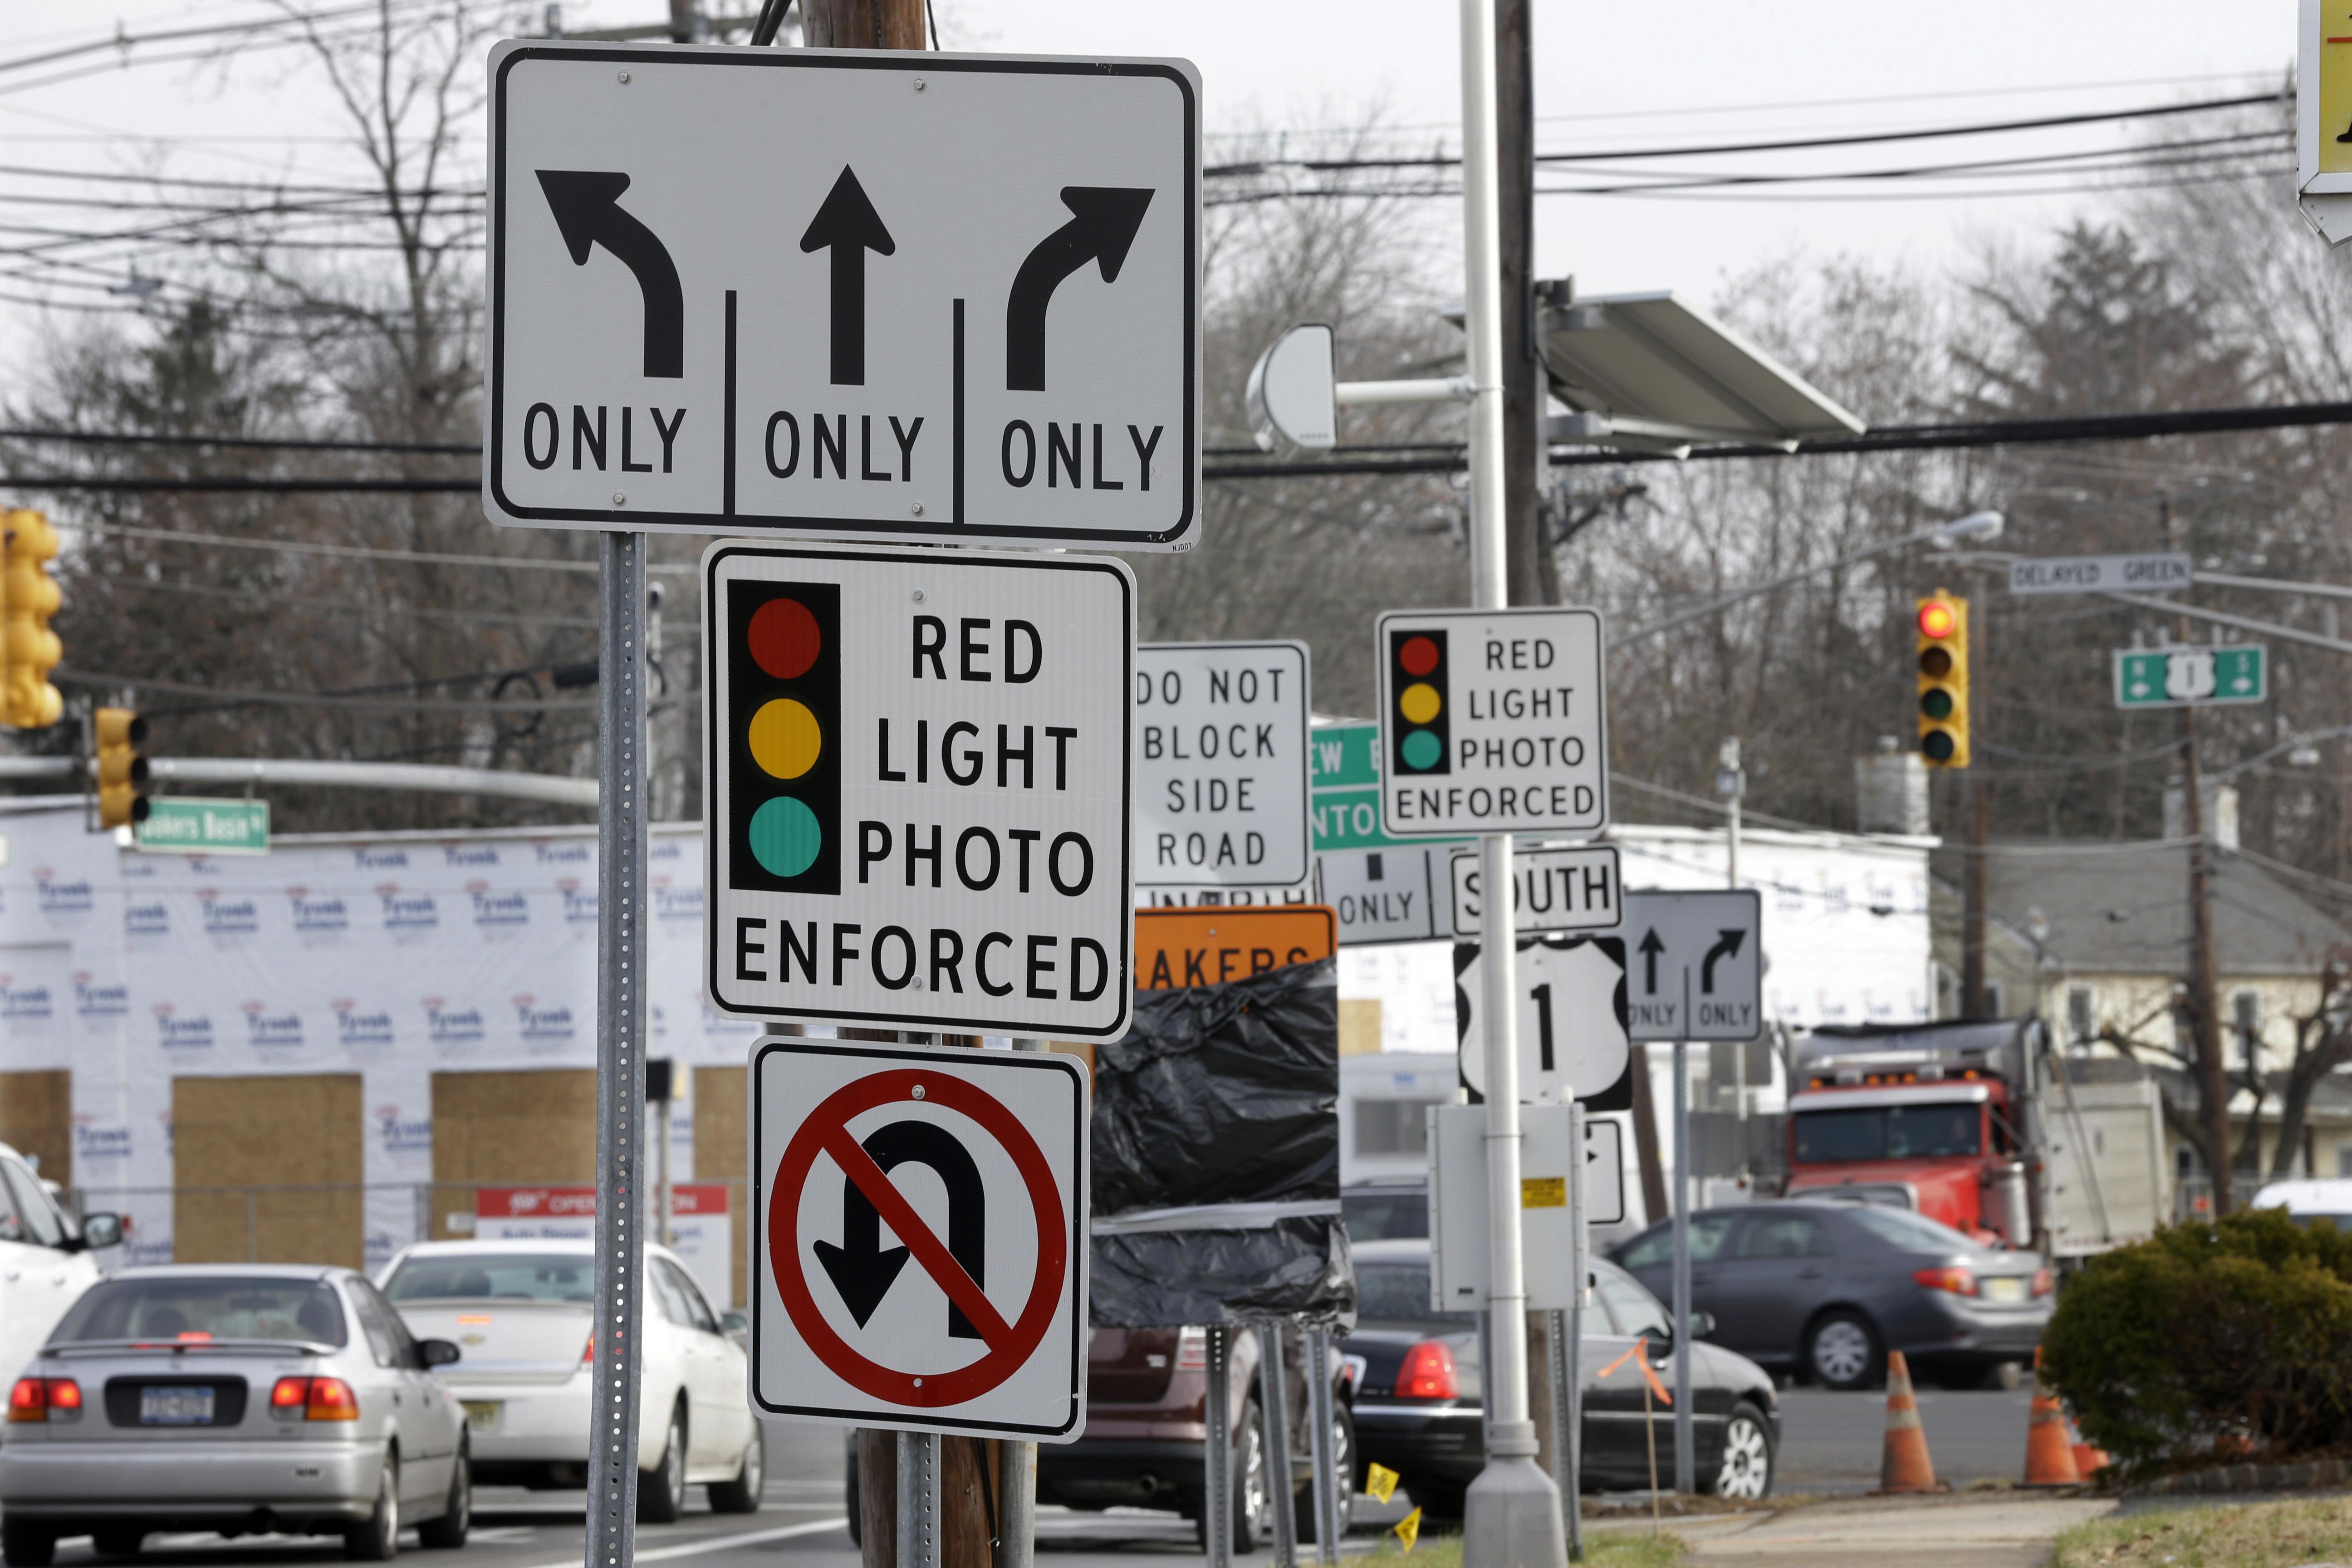 17 Traffic On Garden State Parkway Decor23